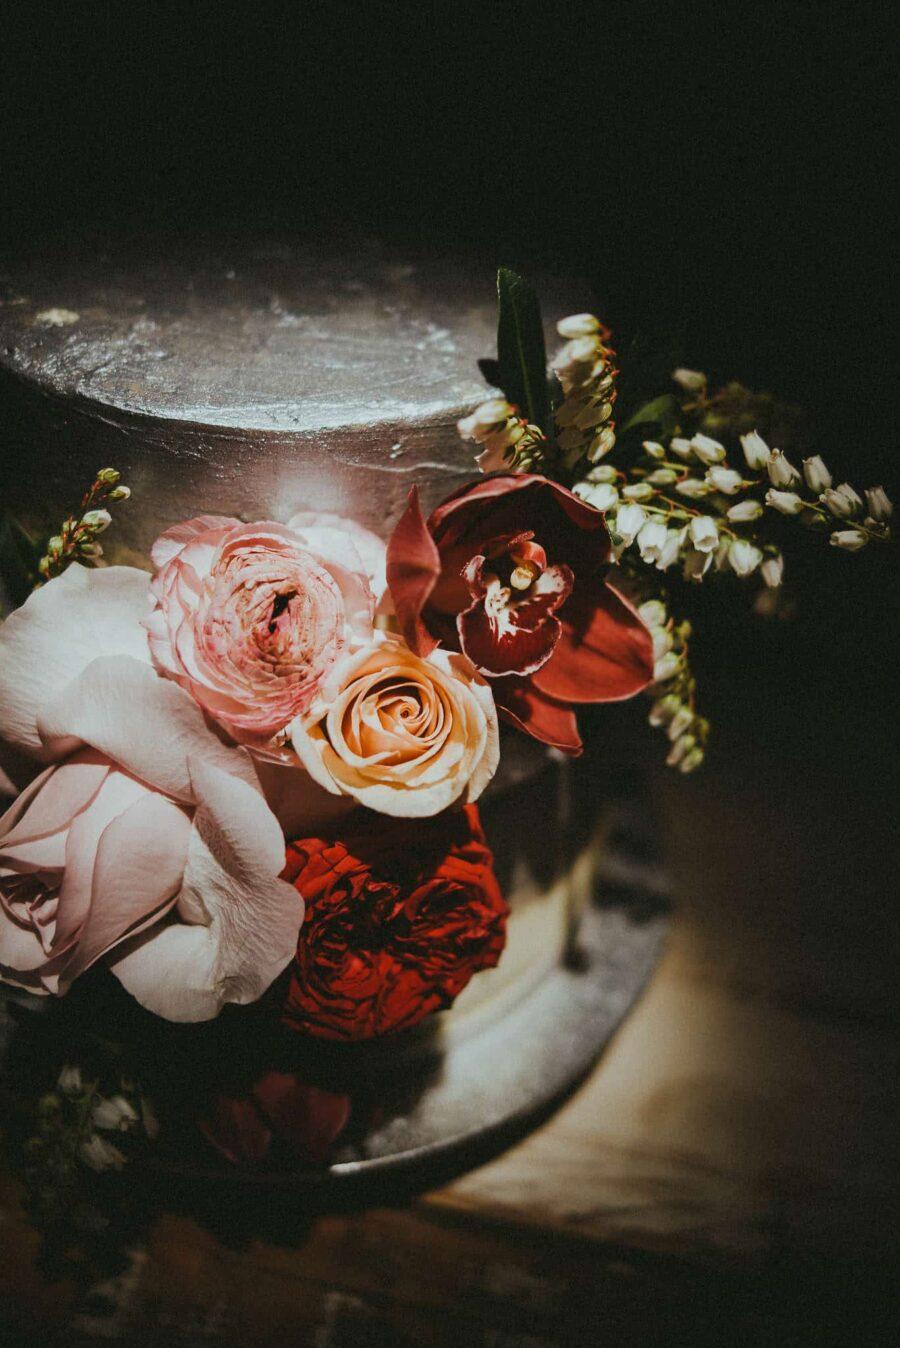 industrial Perth wedding at Fridays Studio – photography by Tanya Voltchanskaya